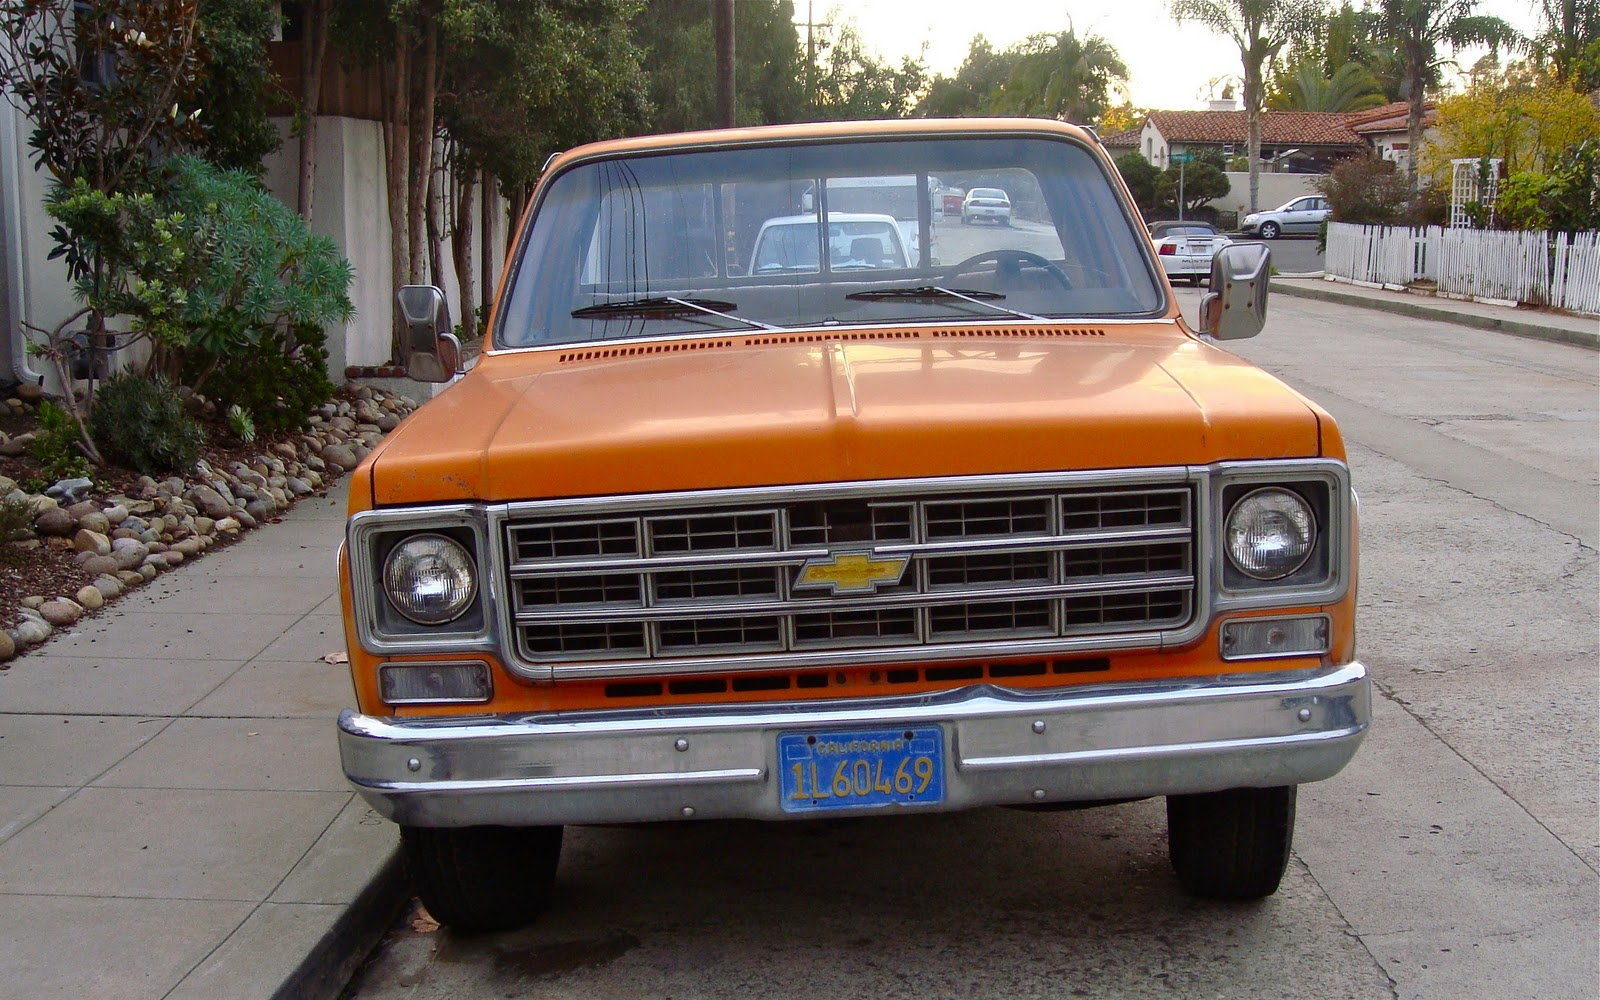 All Chevy c20 chevy : THE STREET PEEP: 1977 Chevrolet C20 Cheyenne